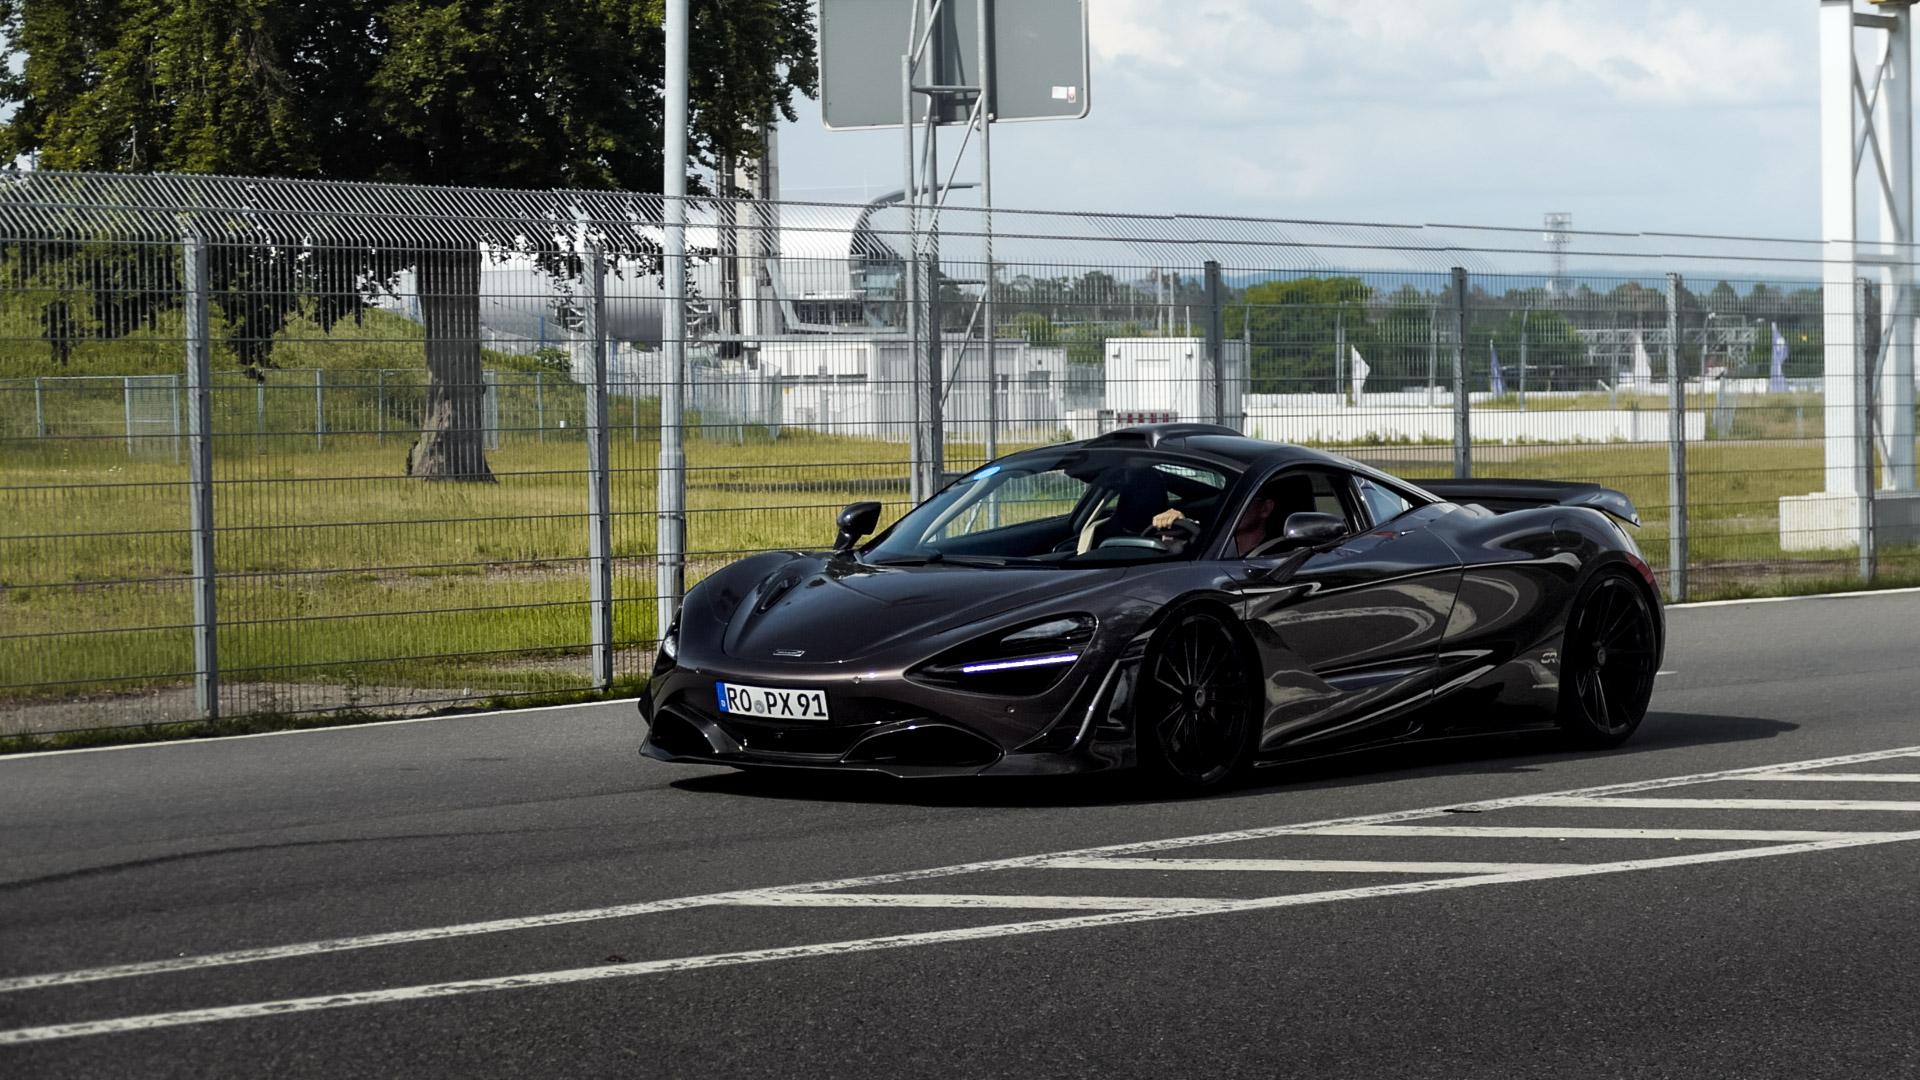 McLaren 720S Novitec - RO-PX-91